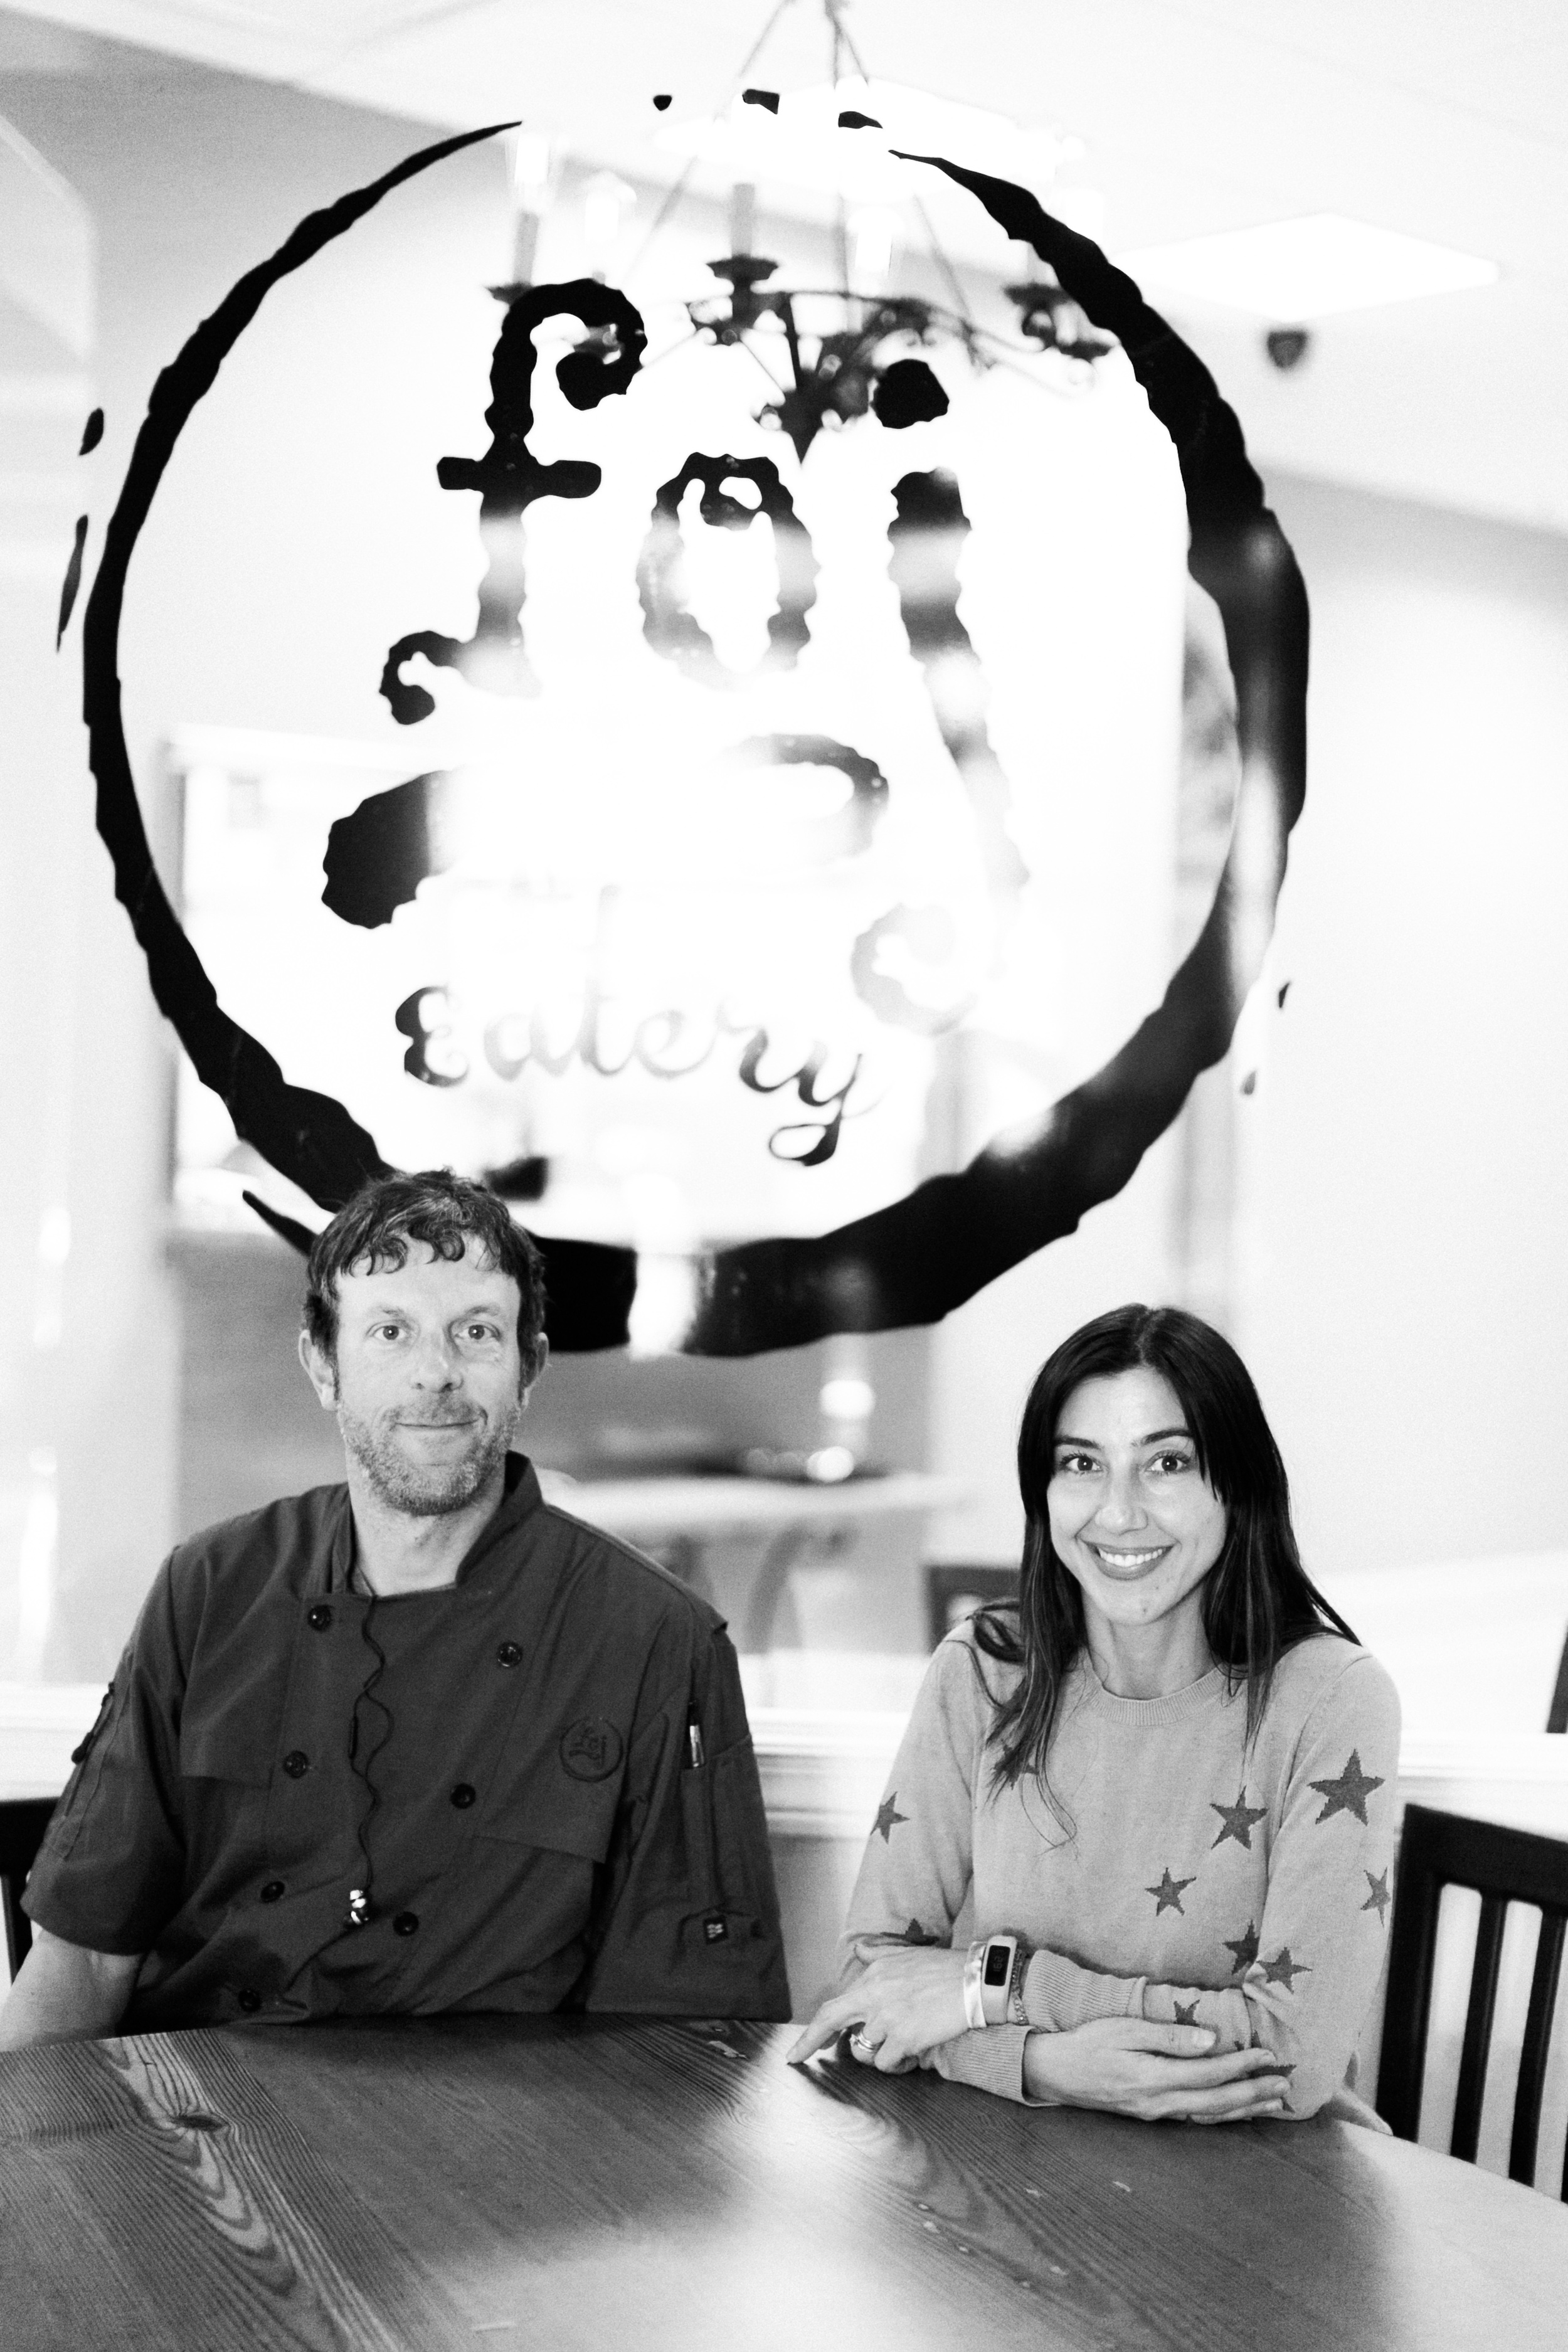 Photo: Owner Natasha Phillips and husband Carl //  All images (c) of Haley Sheffield.